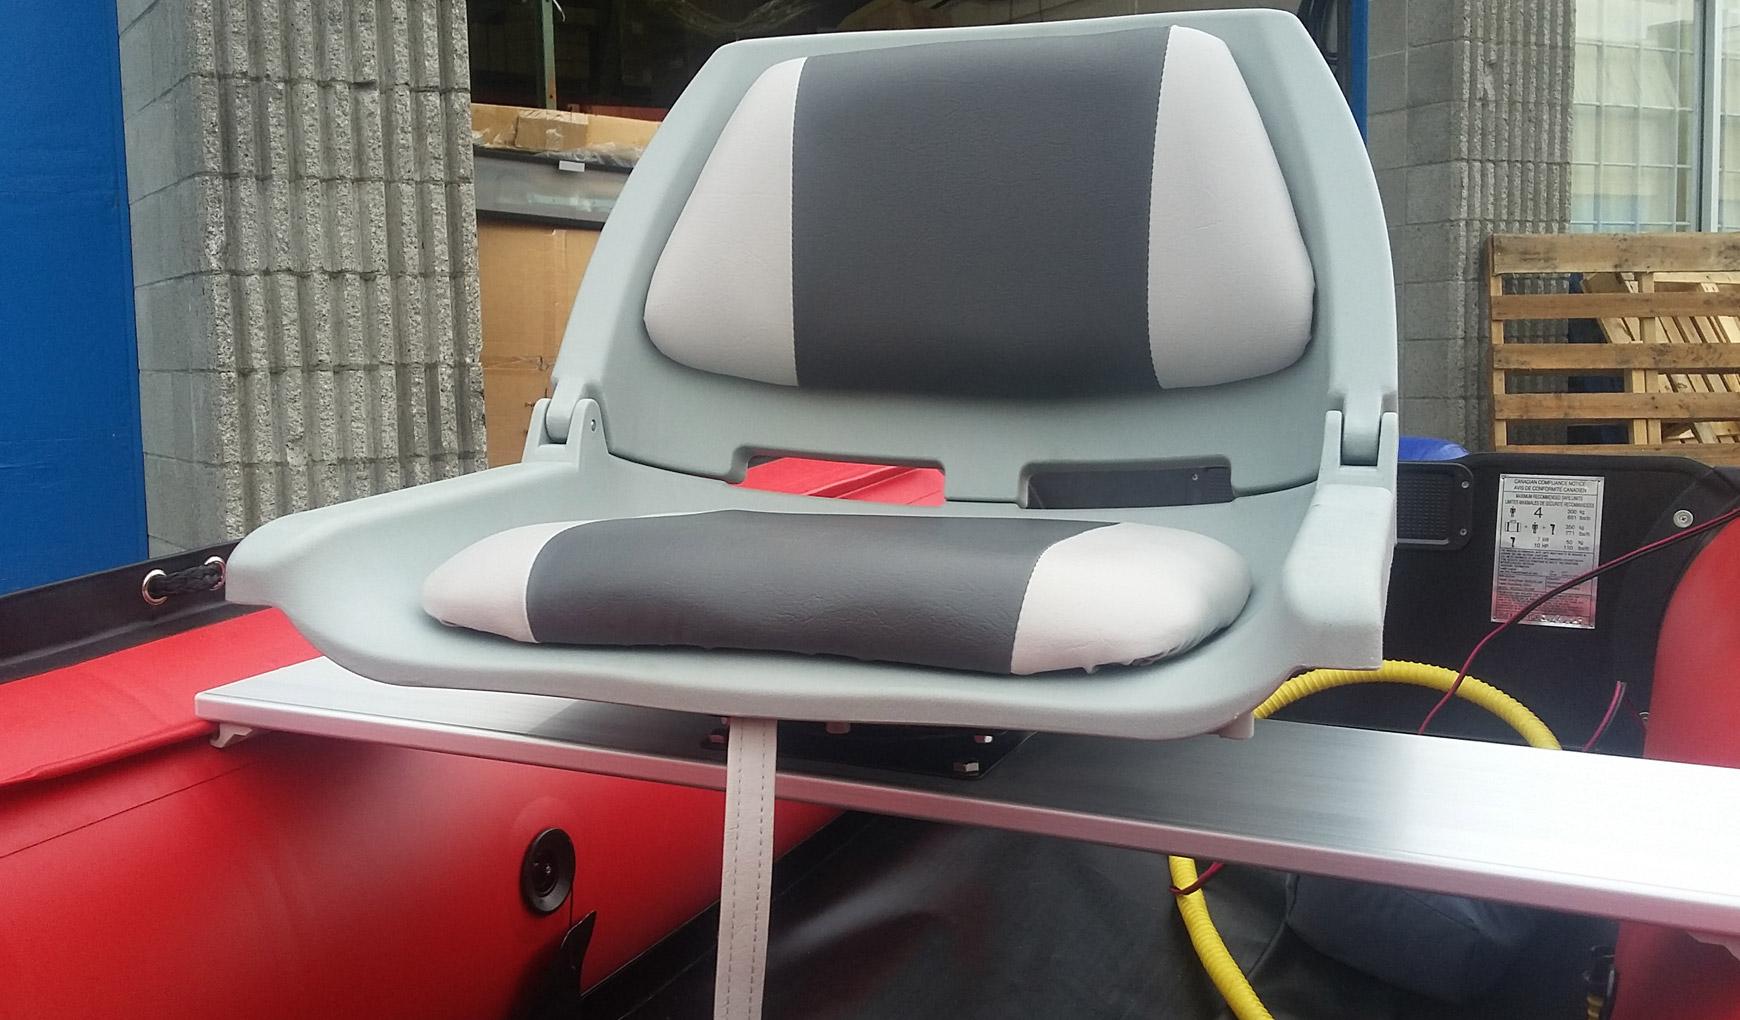 Boat Seat Stainless Swivel Marine Seat Base Mount